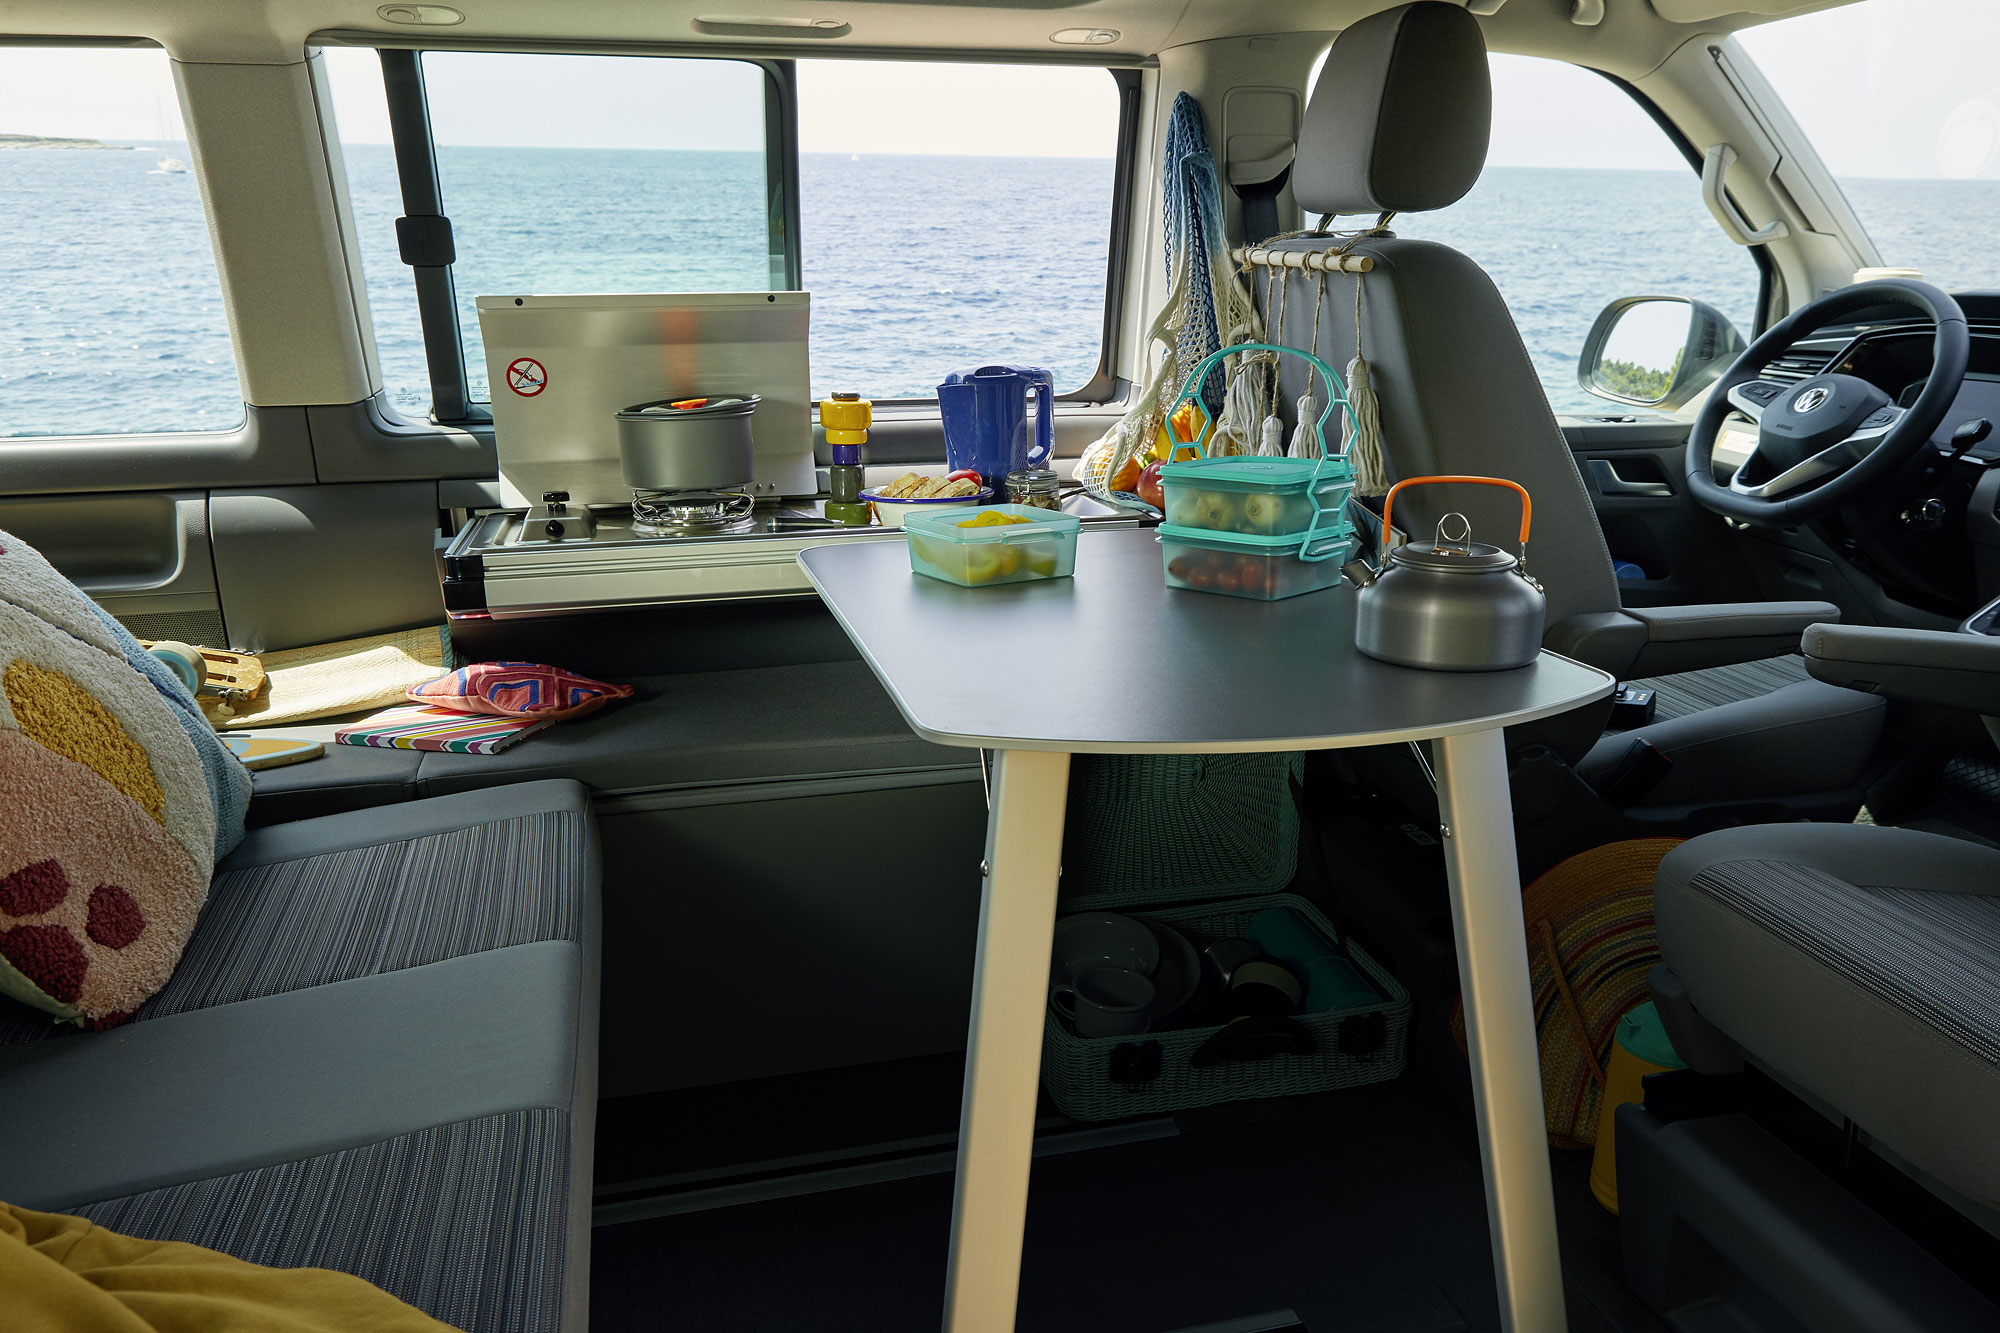 Beach Camper 首度在 California Beach 中導入廚房套件。